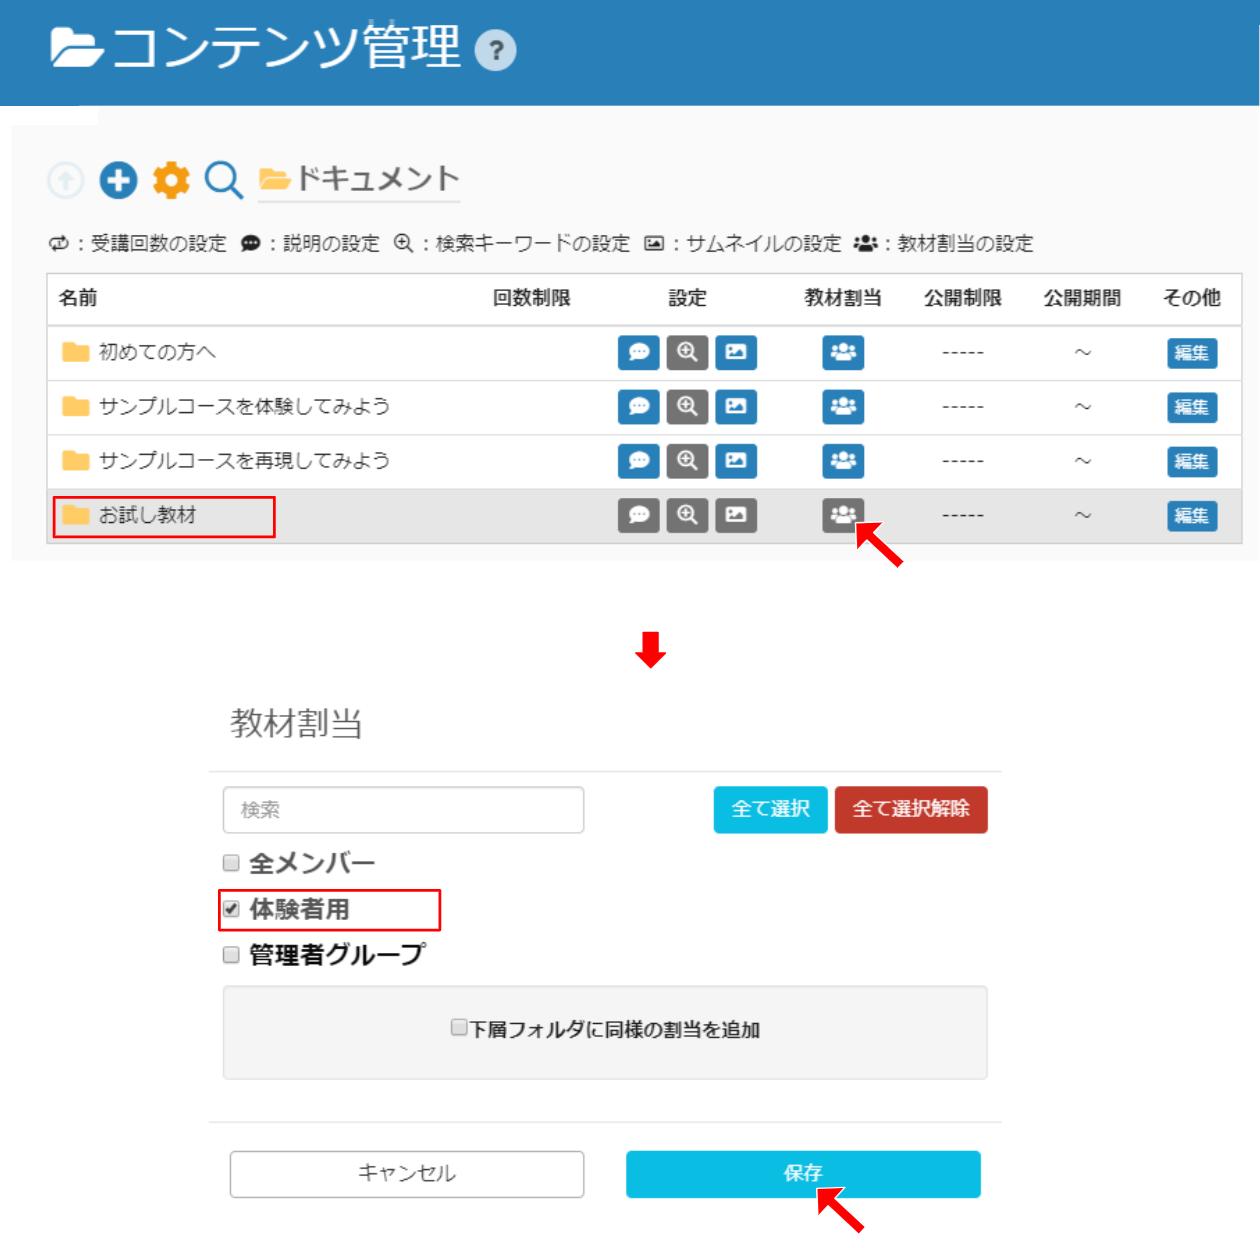 learningBOX有効期限コンテンツ管理